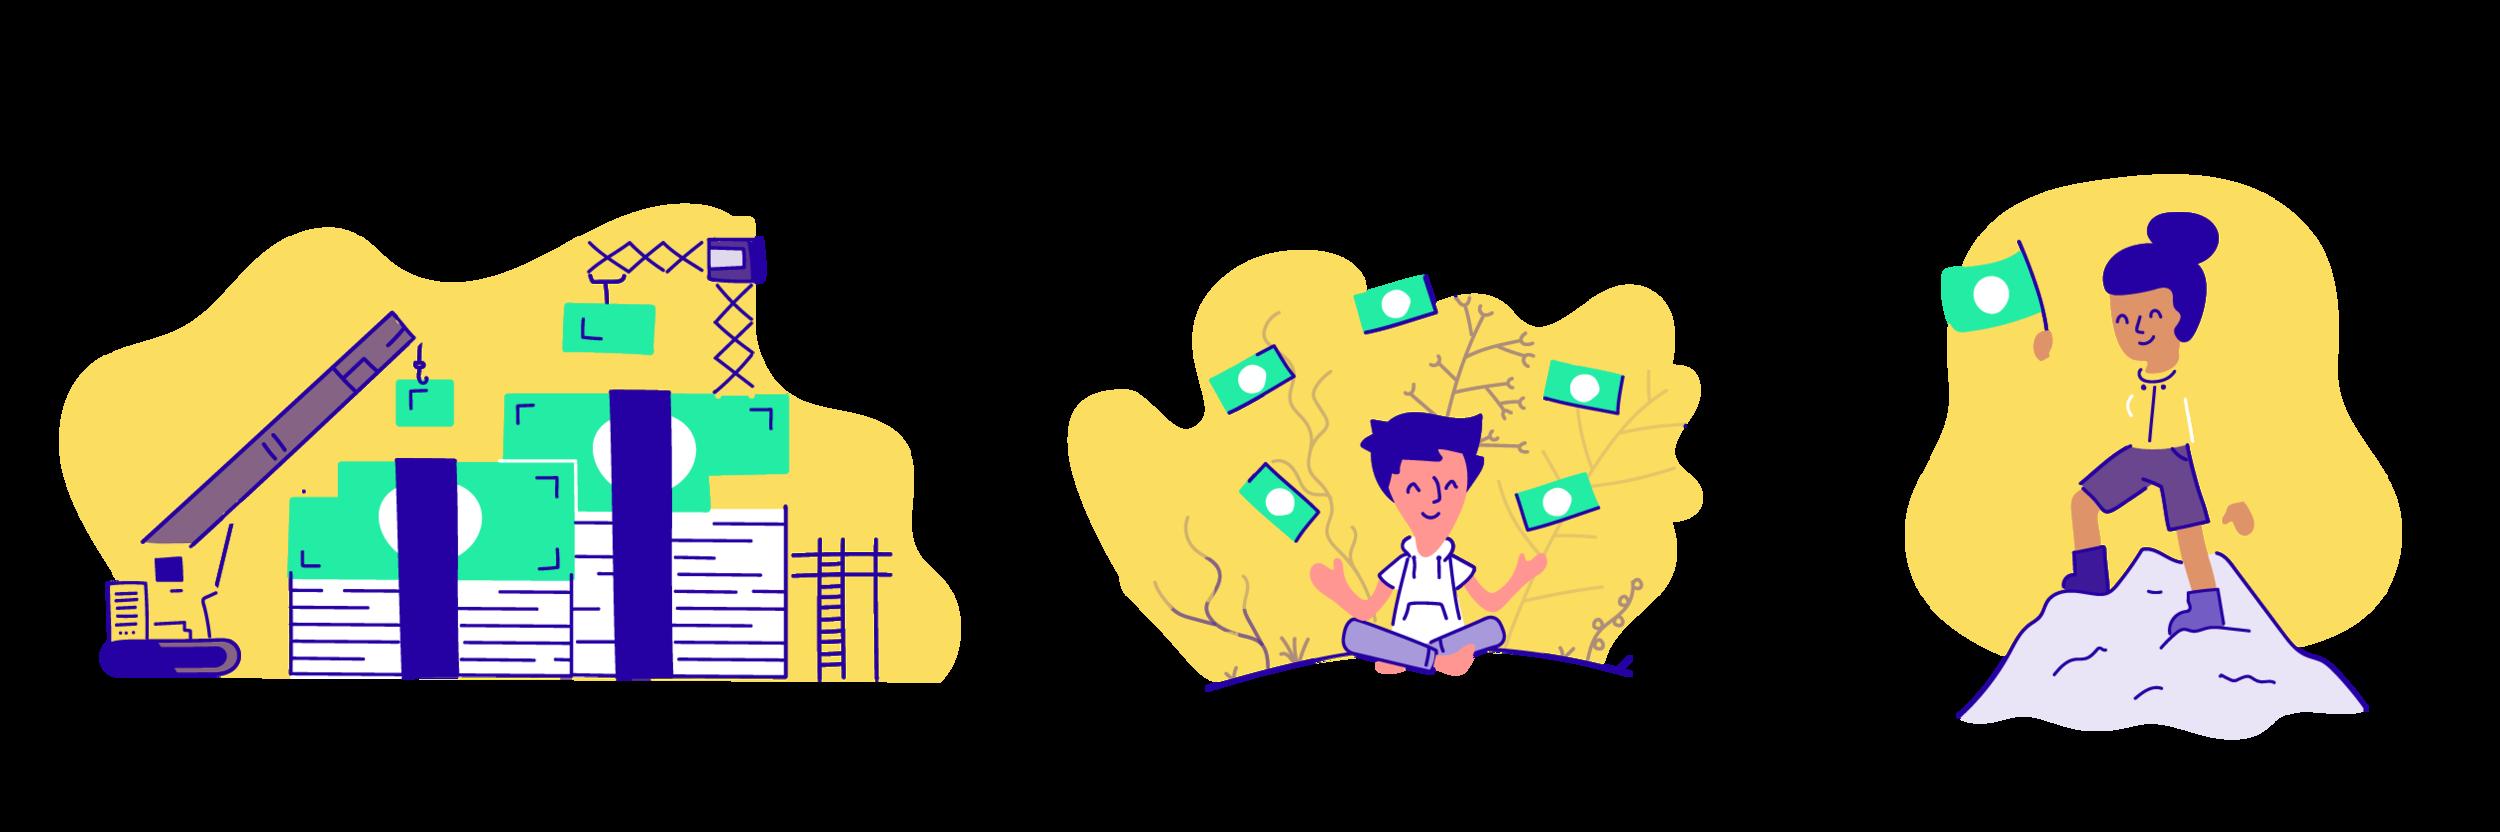 Illustrations for an investor presentation